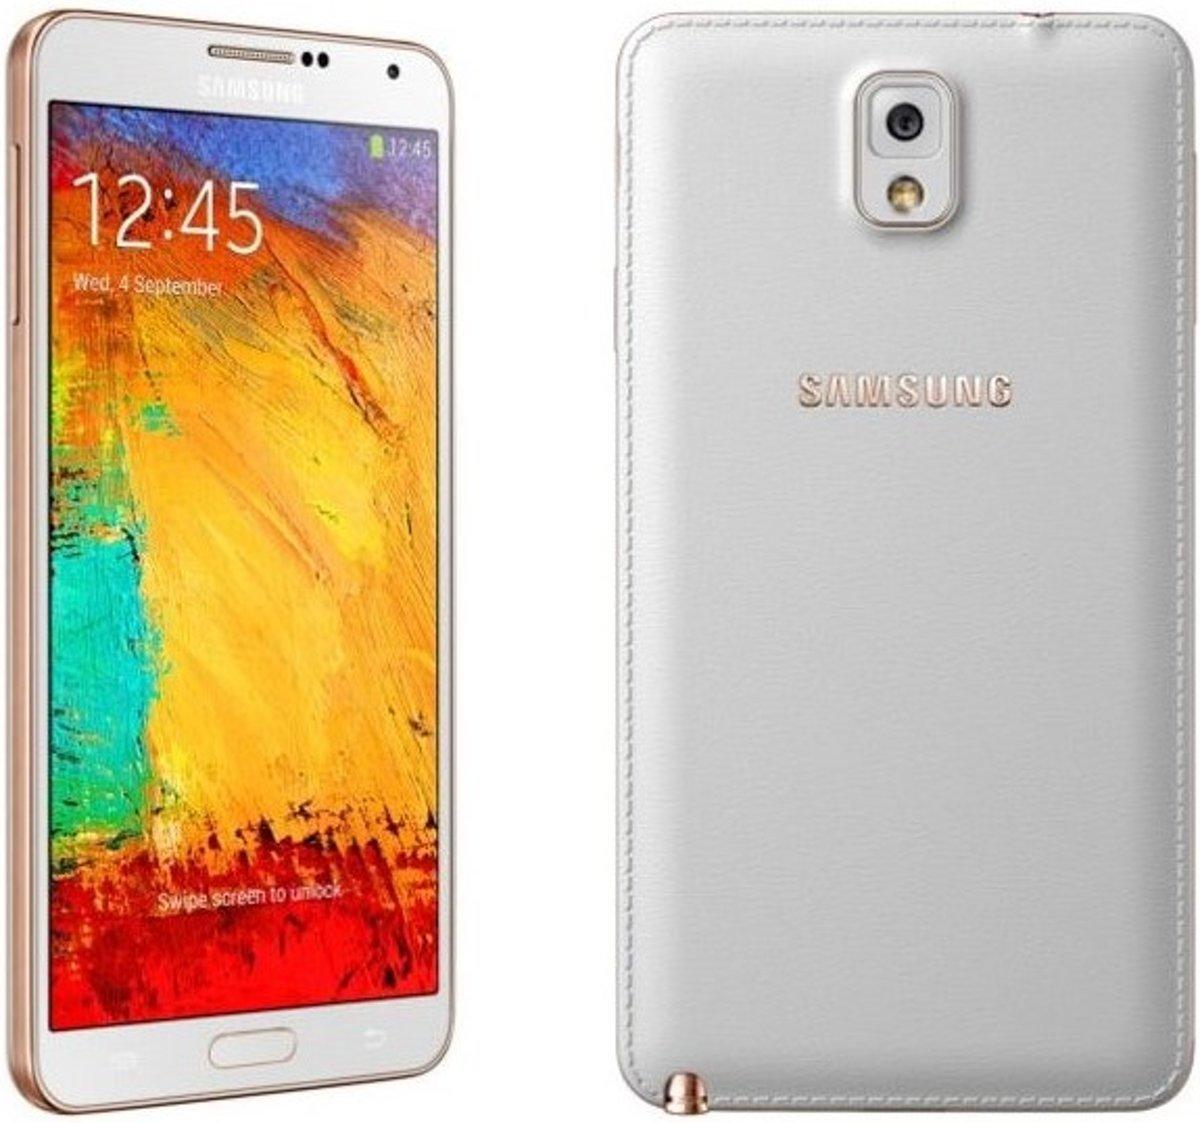 Samsung Galaxy Note 3 Rose Gold White kopen